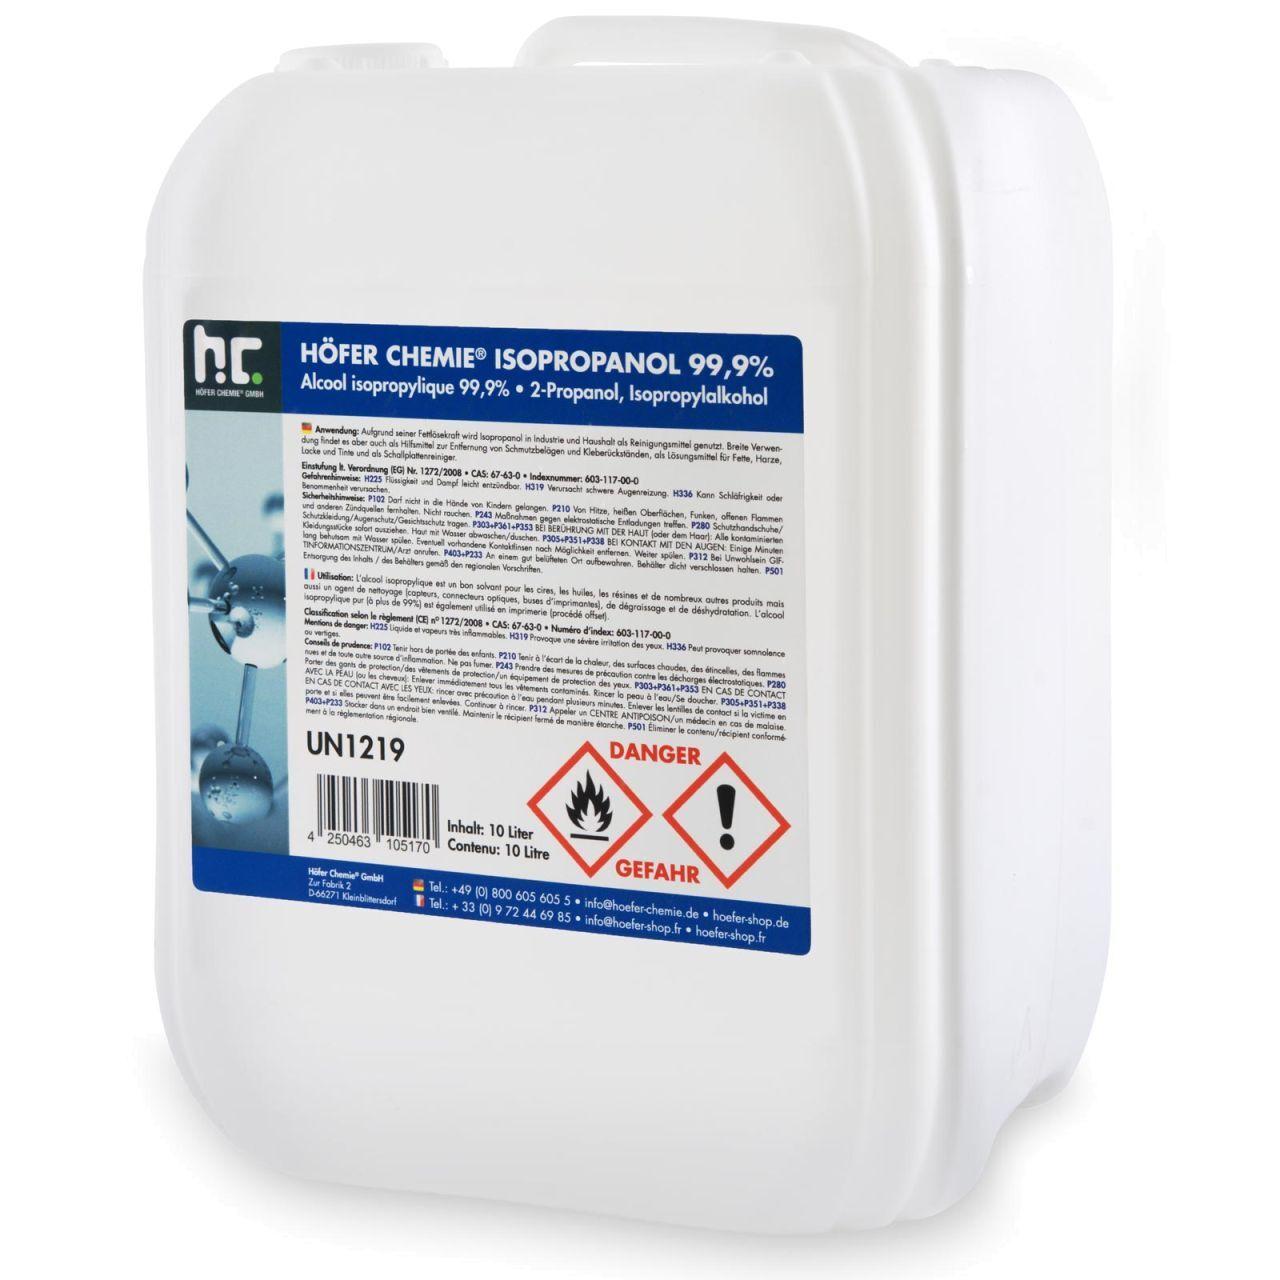 Höfer Chemie 120 l Alcool isopropylique 99,9 % (12 x 10 l)